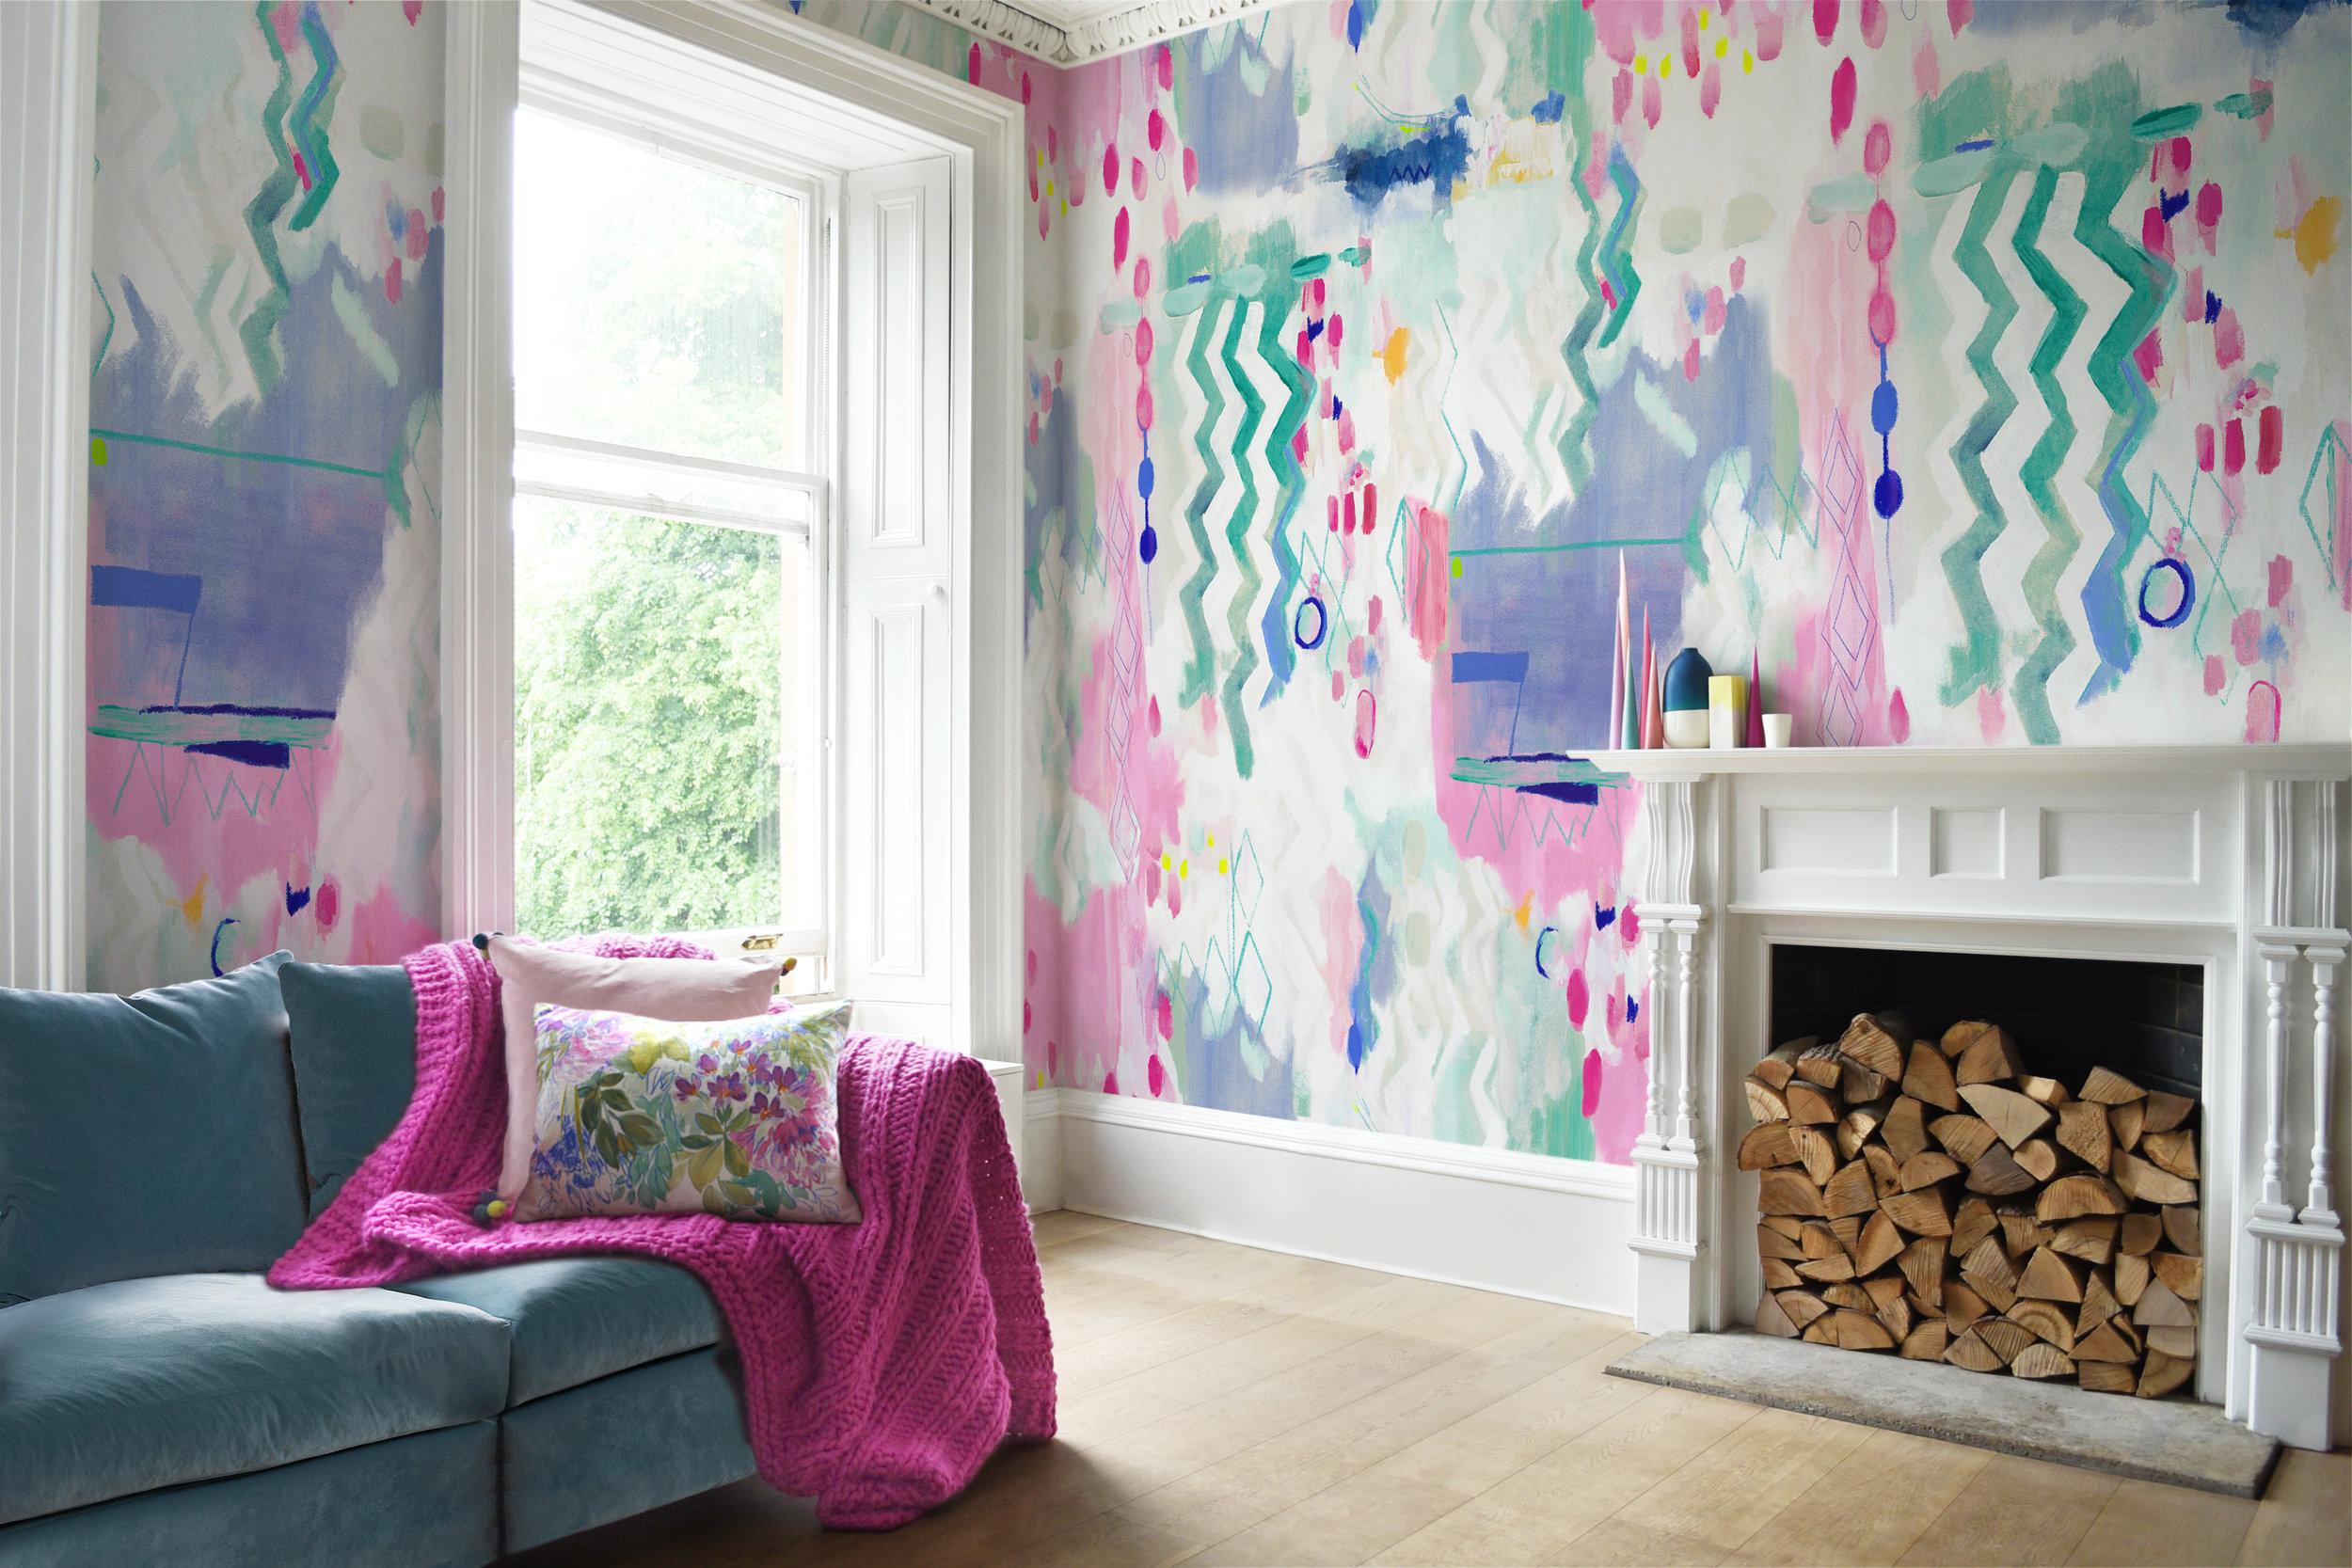 bluebellgray©Medina - Wendy's Room Wallpaper layers.jpg